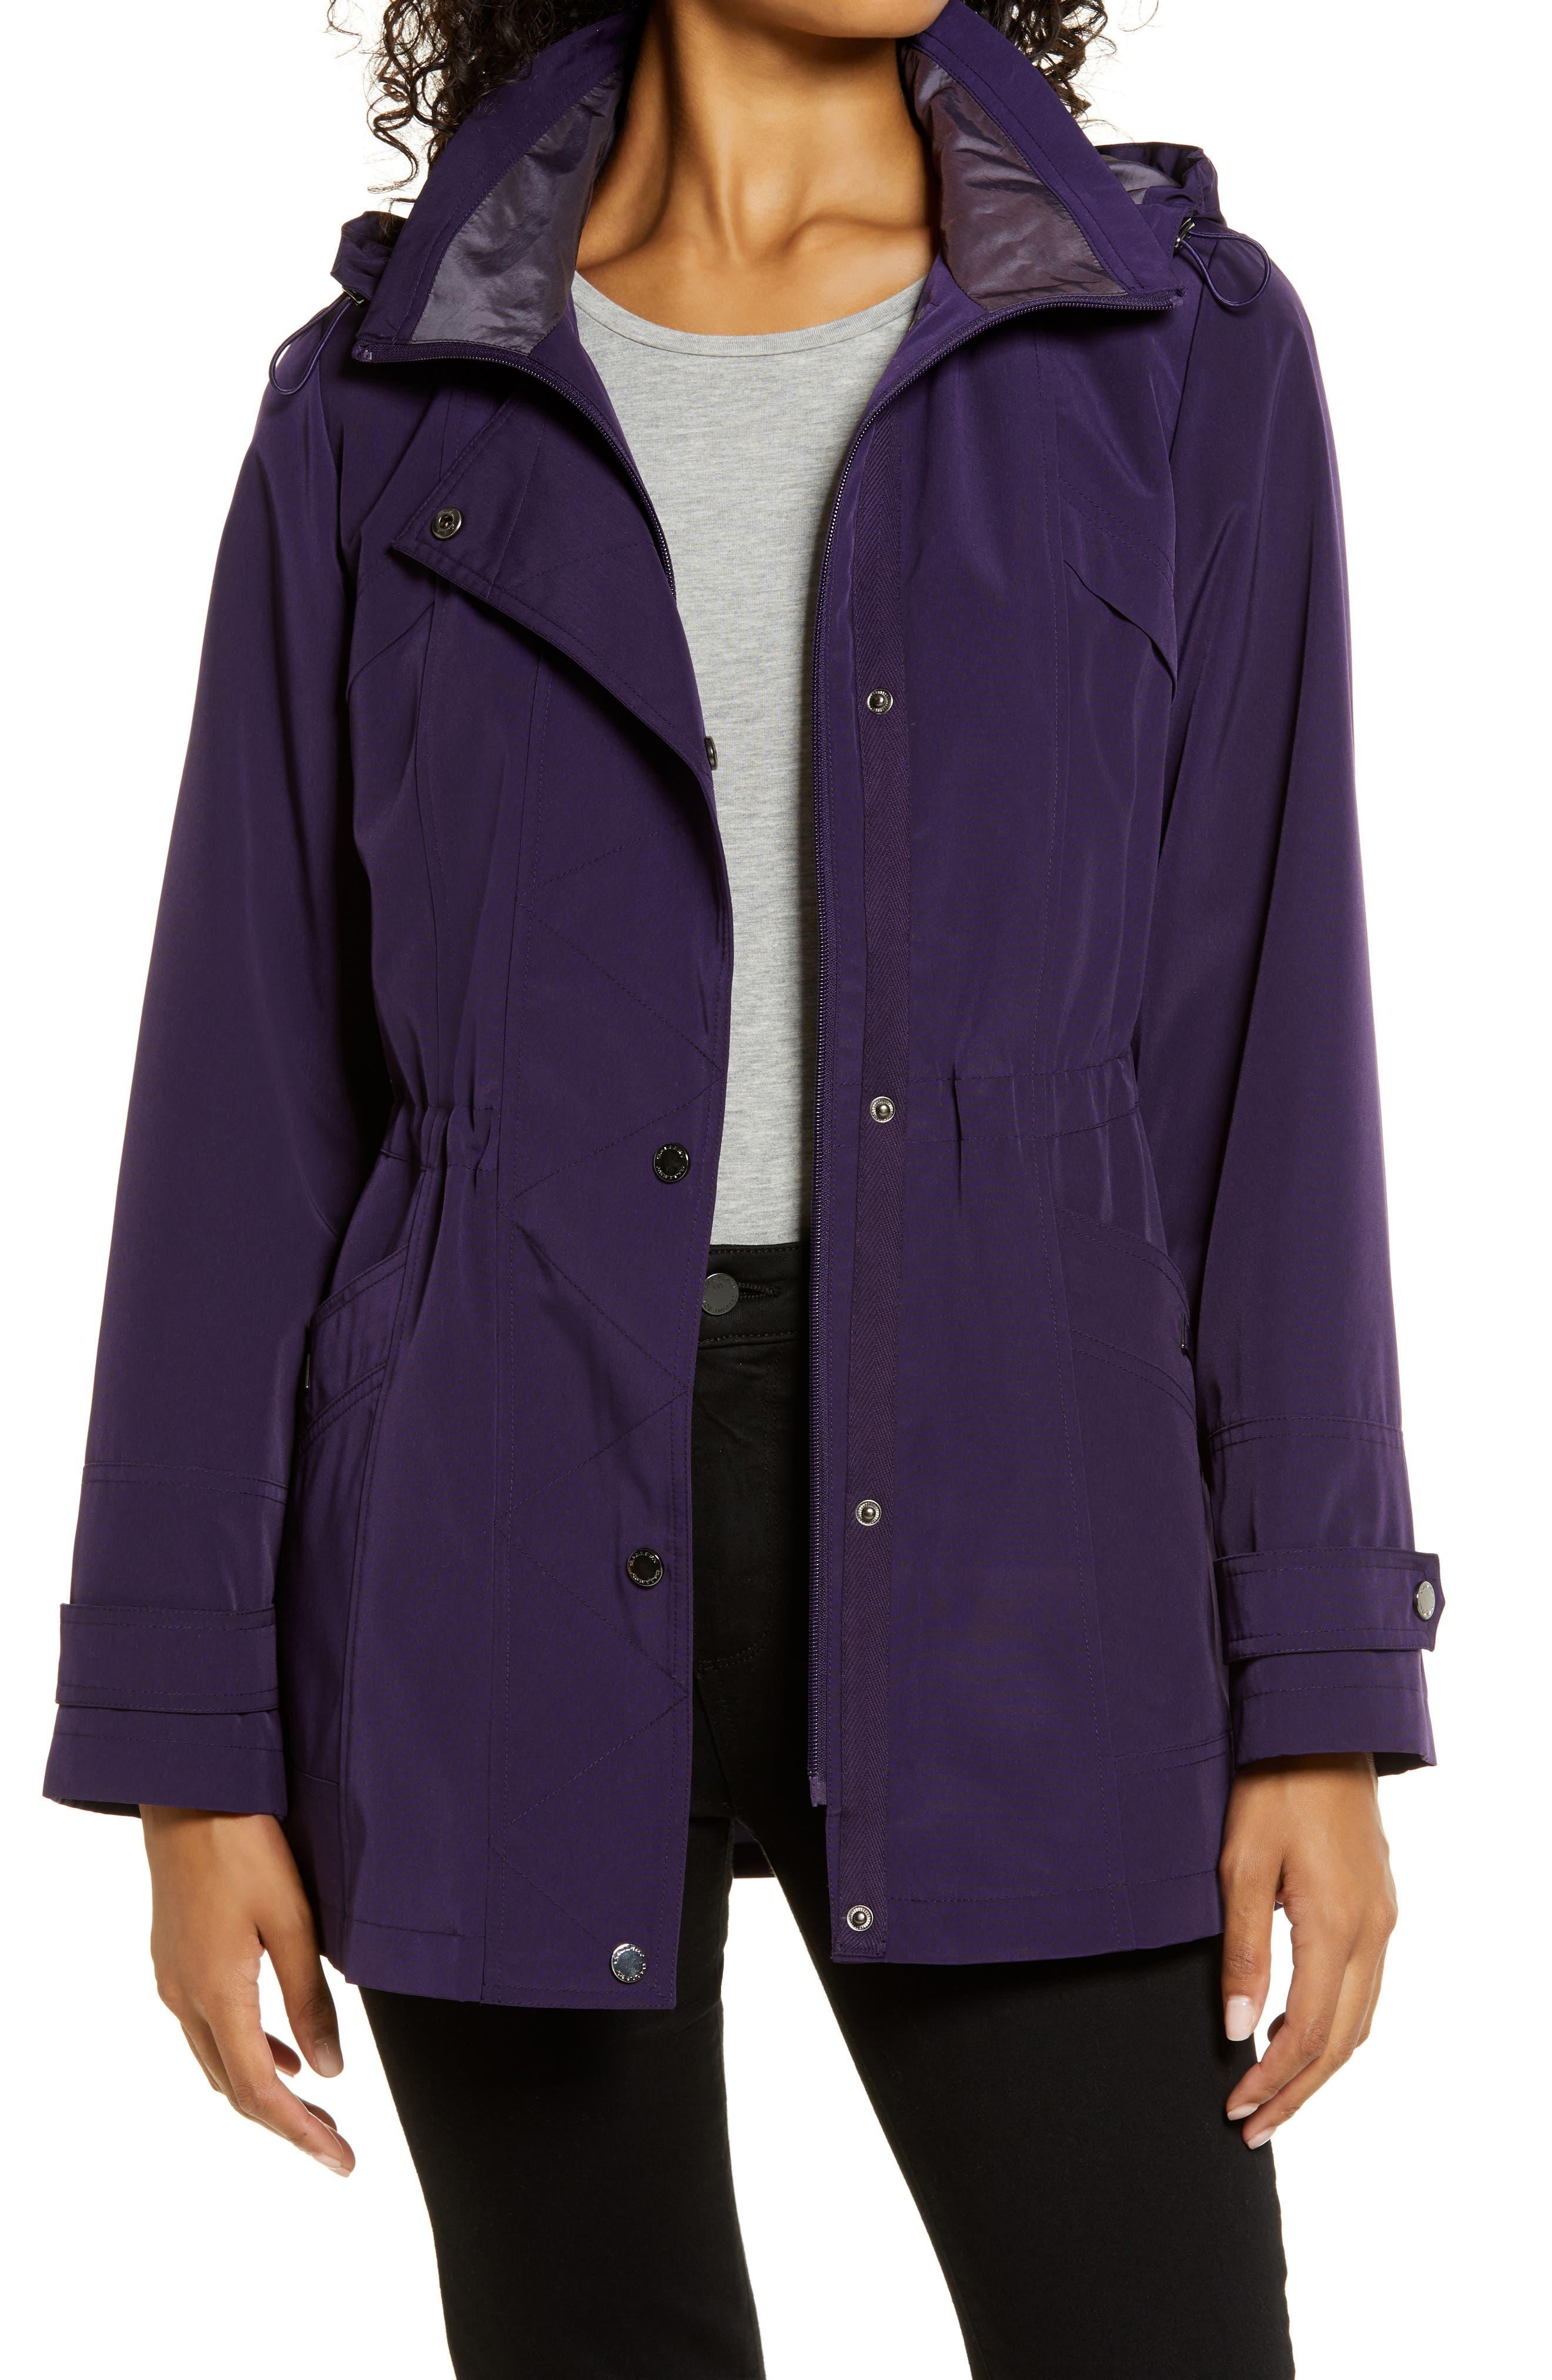 Cinched Waist Hooded Raincoat